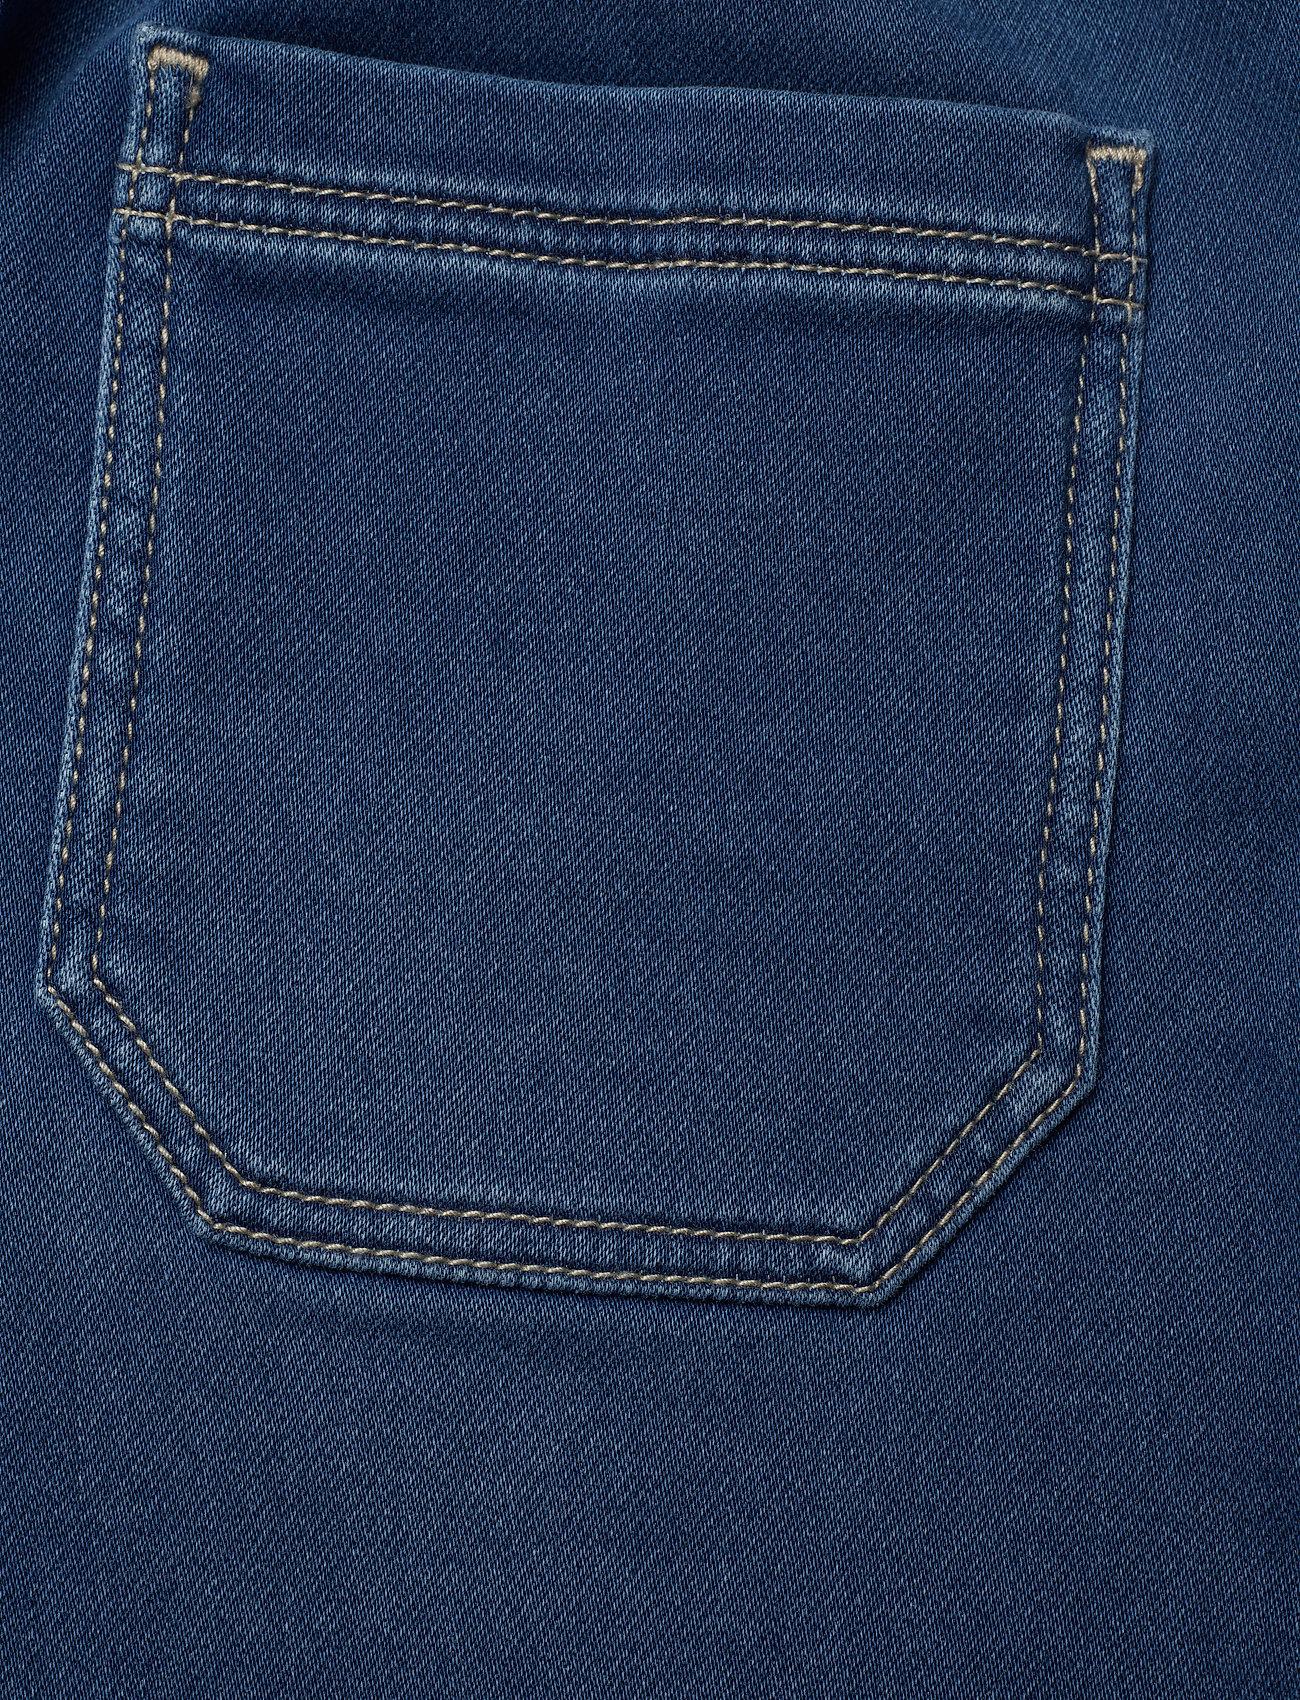 Little Marc Jacobs Bermuda Shorts - Nederdelar Denim Blue